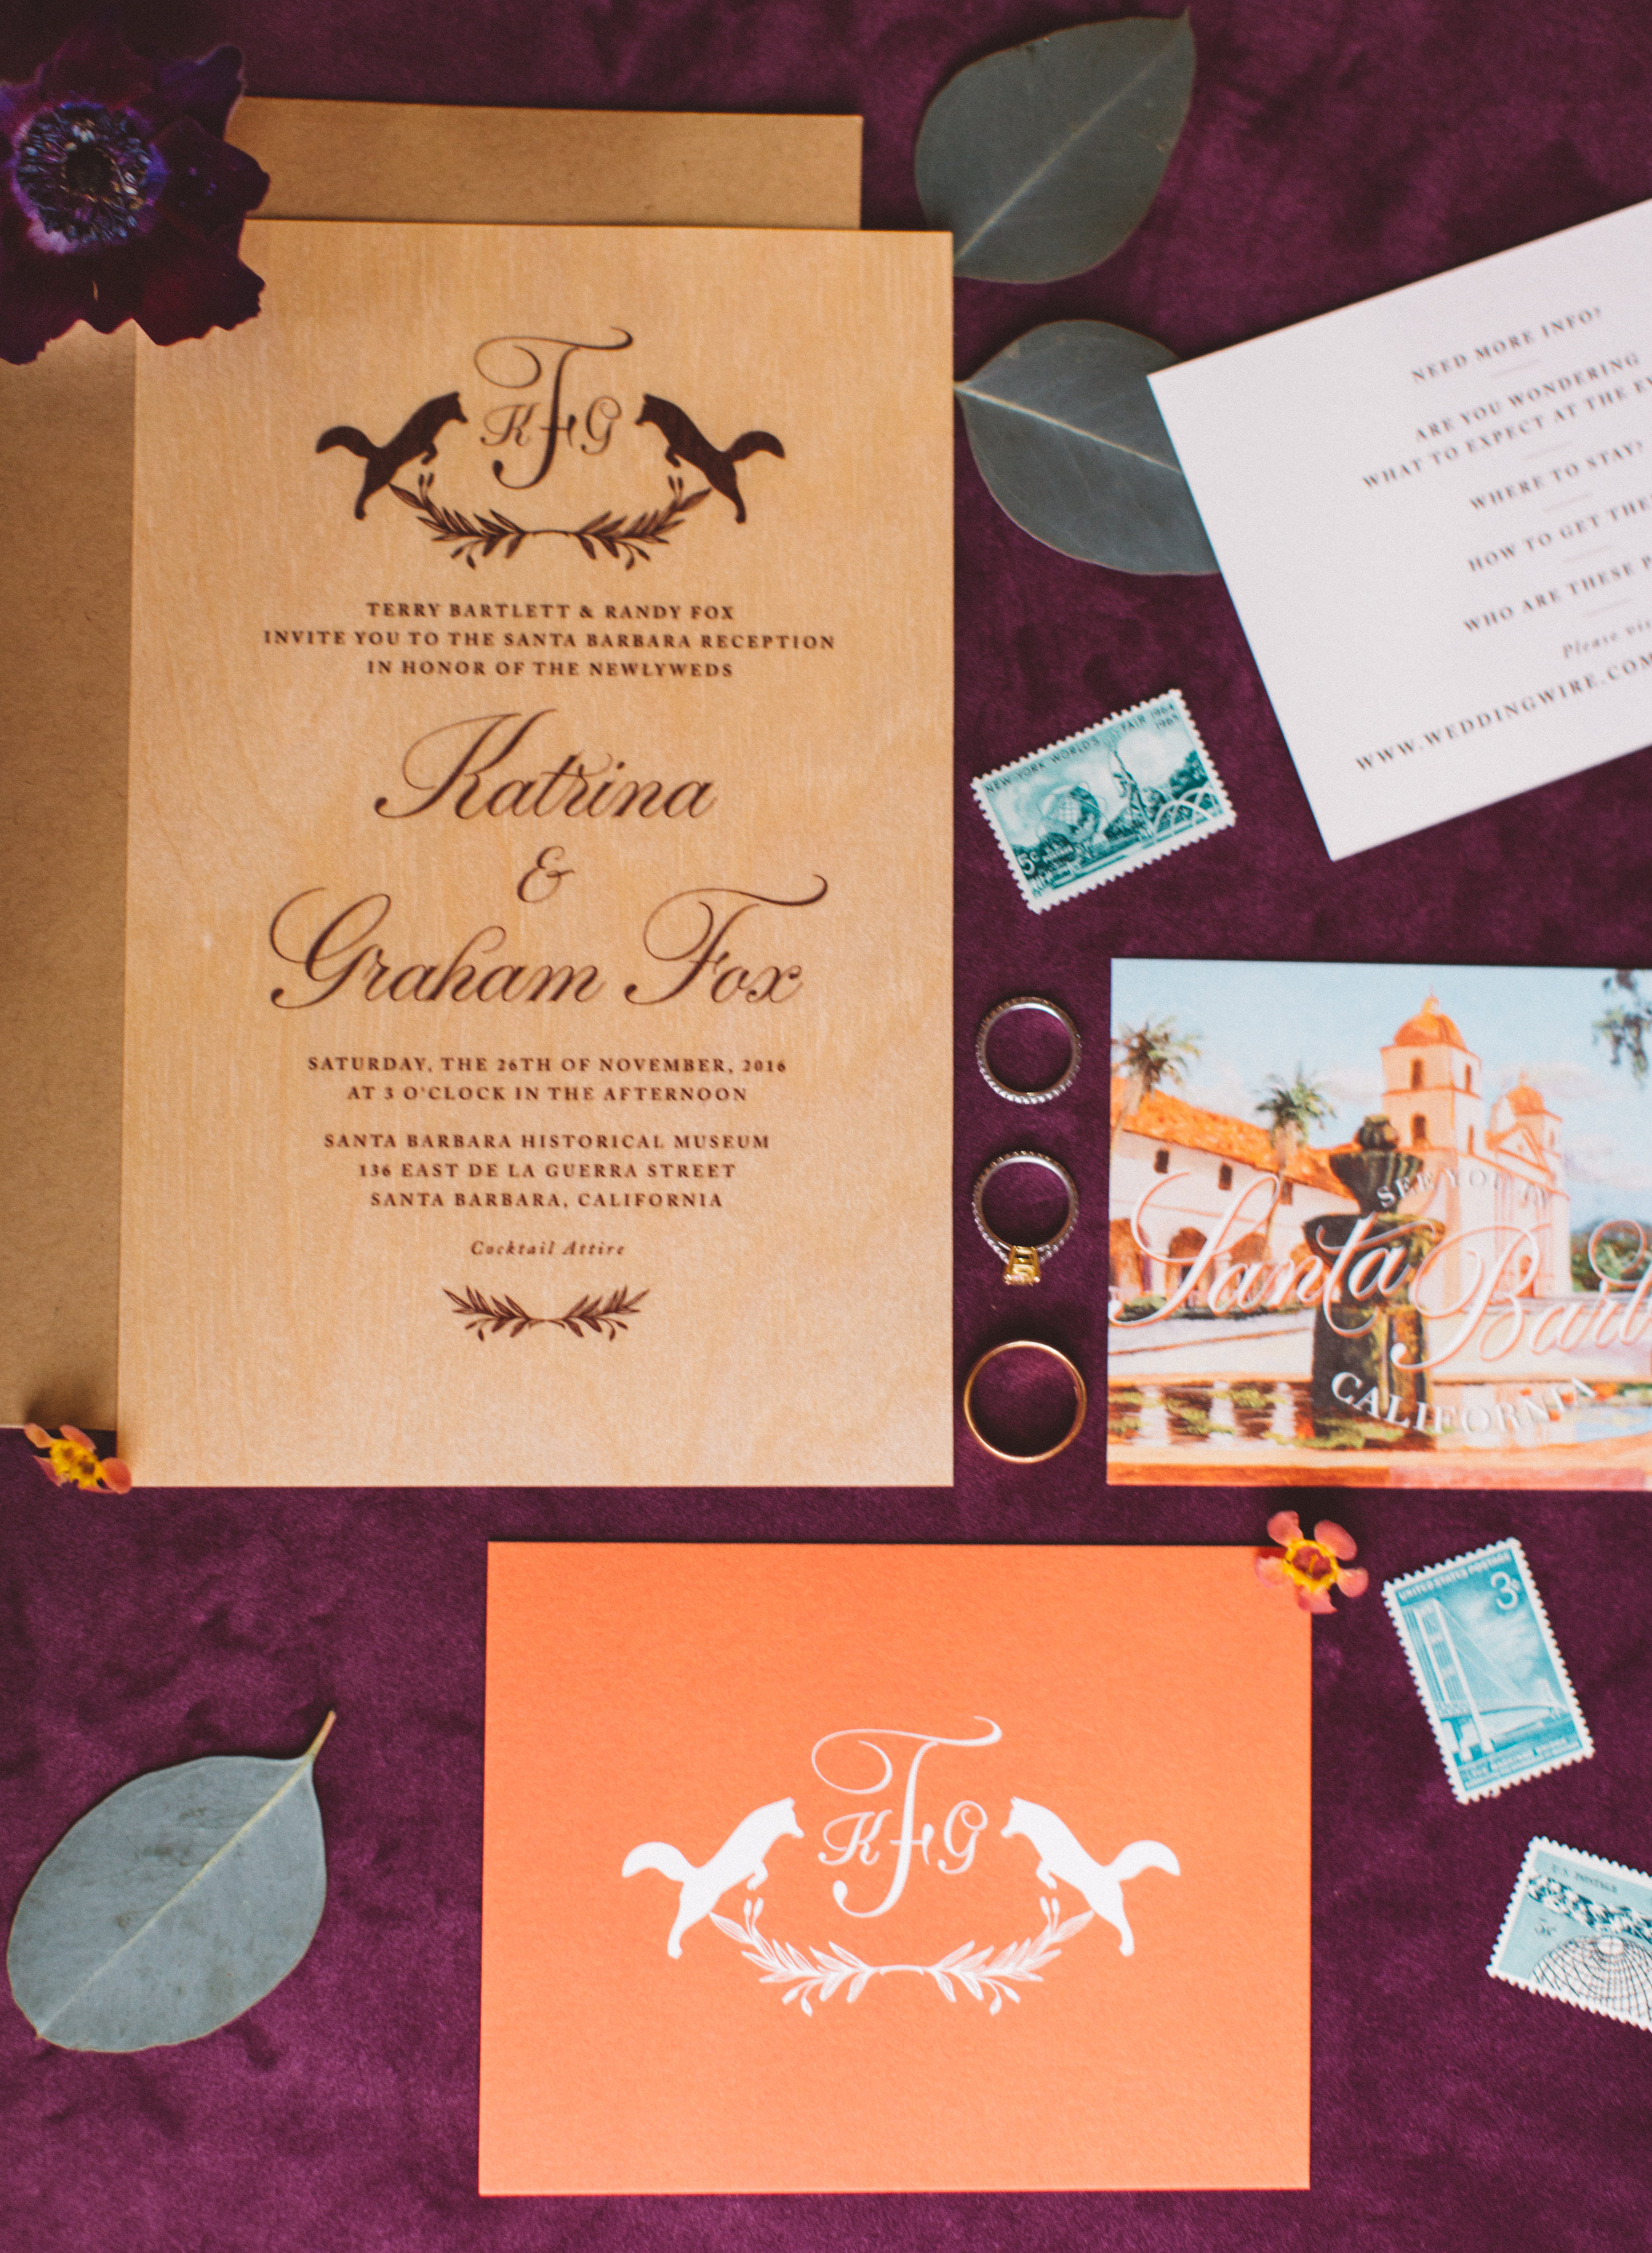 Invitation_Kat&Gram_Favorites_375.jpg